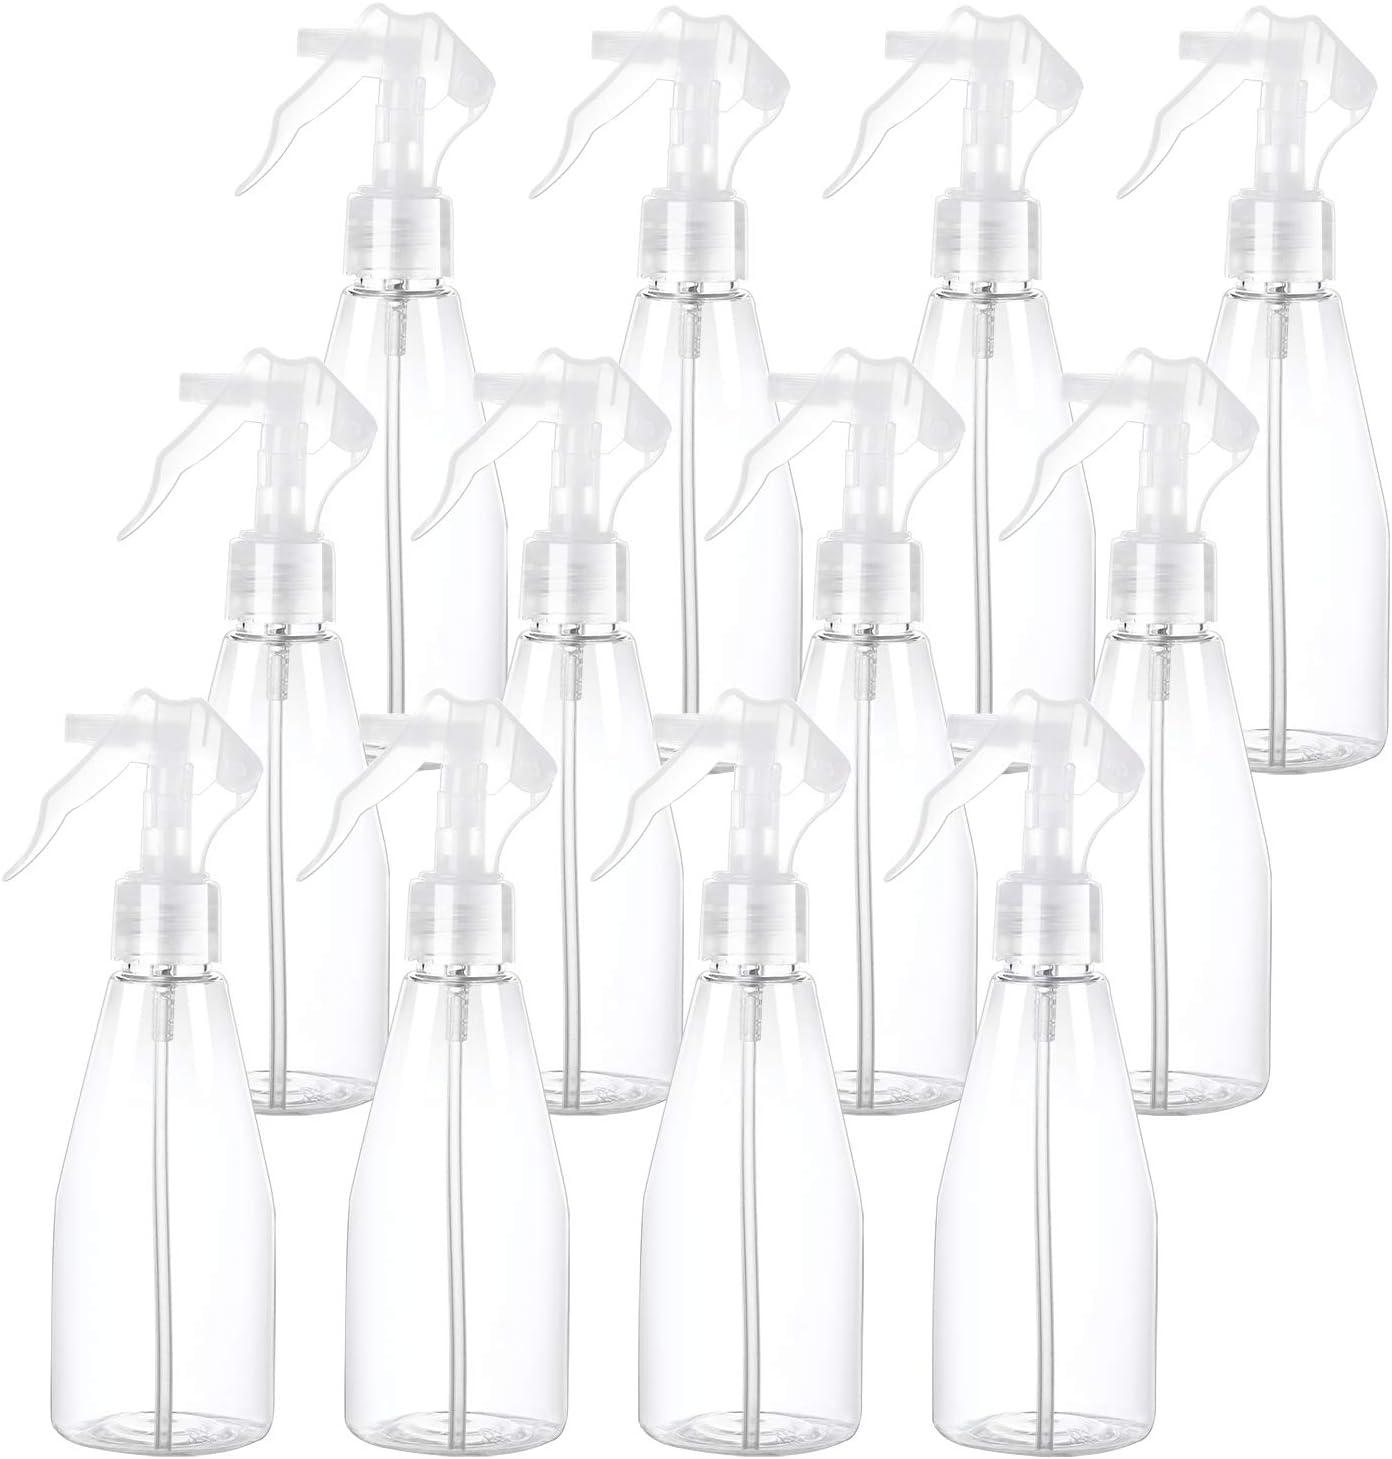 Feeding Elcoho 4 Pieces 200 ml Spray Bottles Empty Bottles Plastic Bottles Trigger Sprayer for Cleaning Gardening